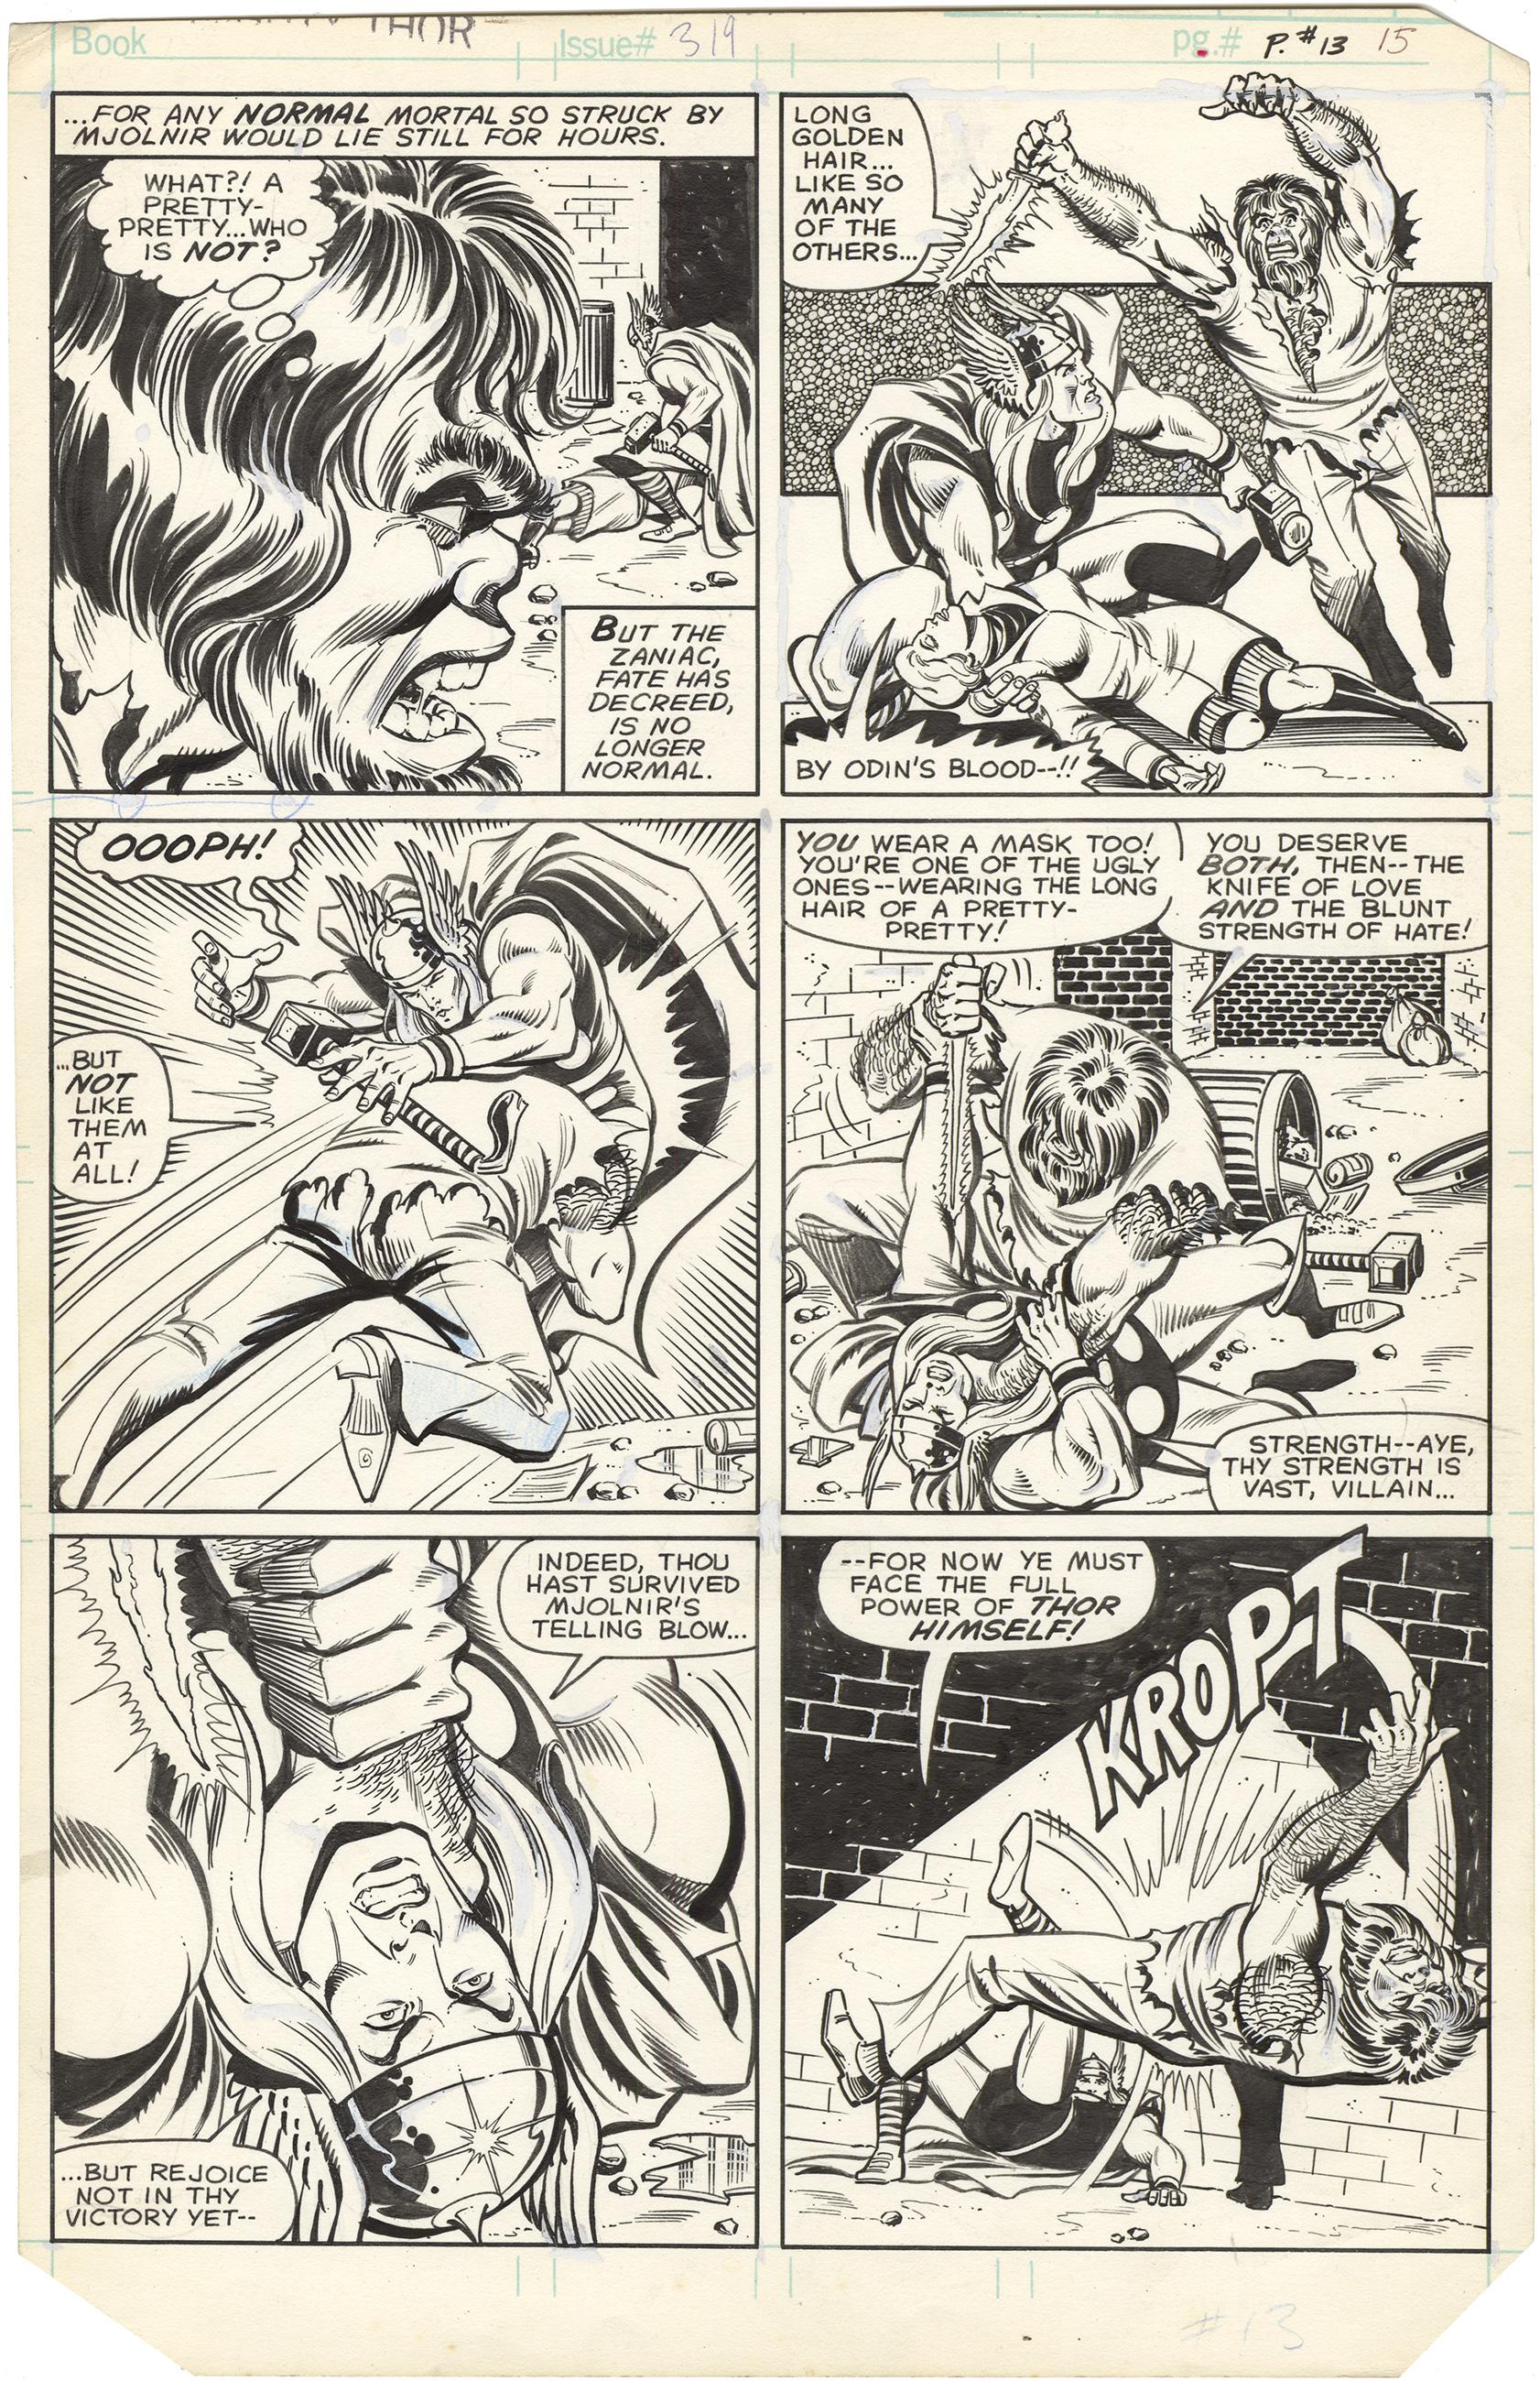 Thor #319 p13